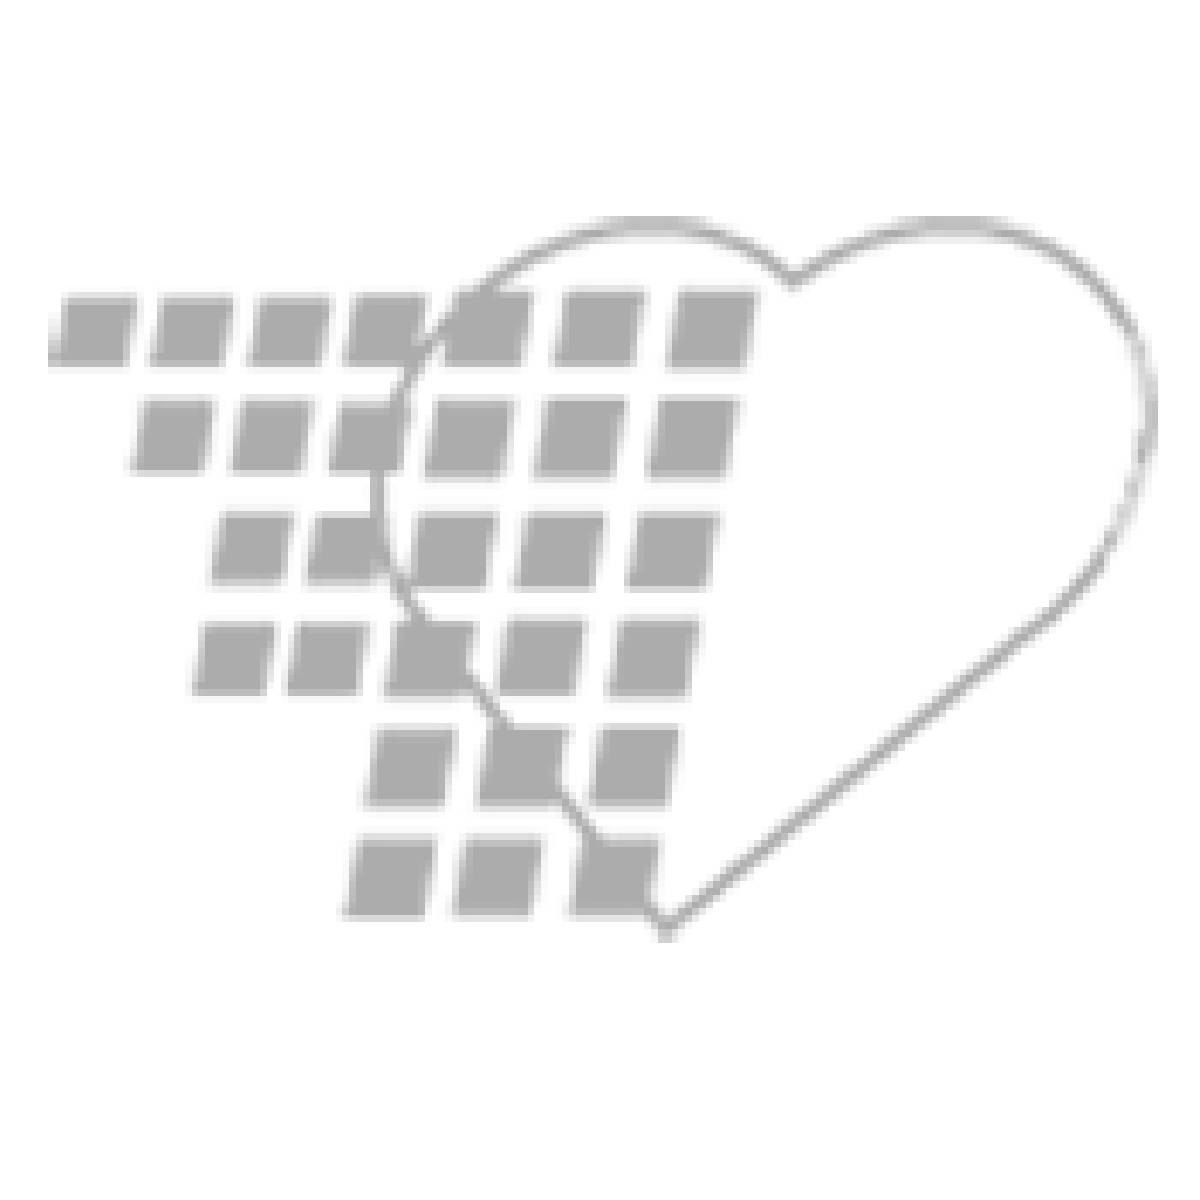 05-84-1707-HNTRGRN - Ribcord Bedspread - Hunter Green